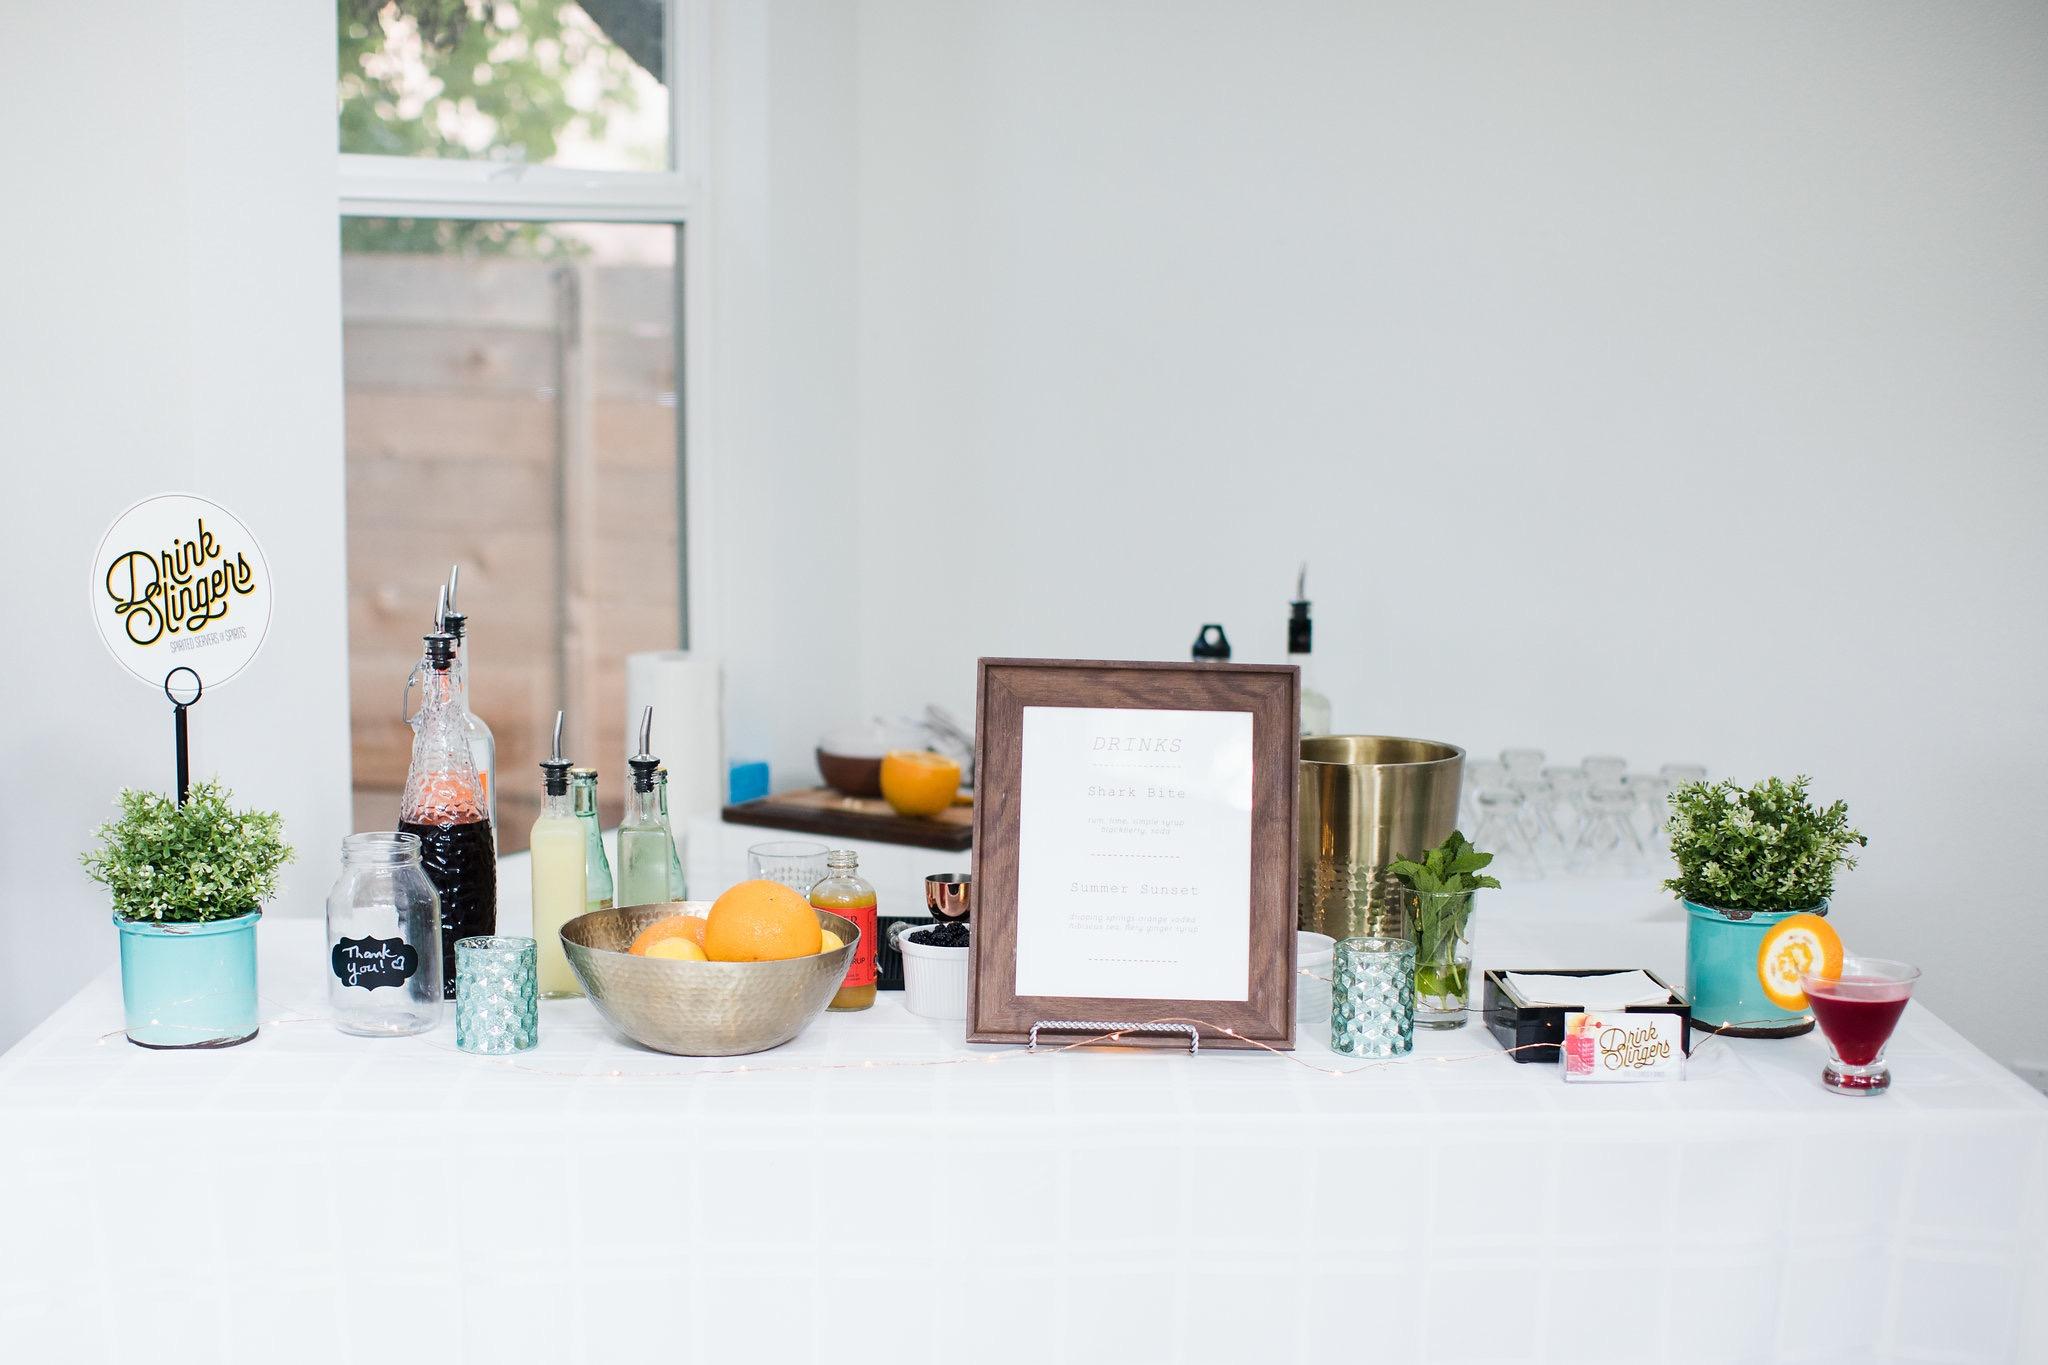 austin-event-bartender-standard-slinger-image.jpg